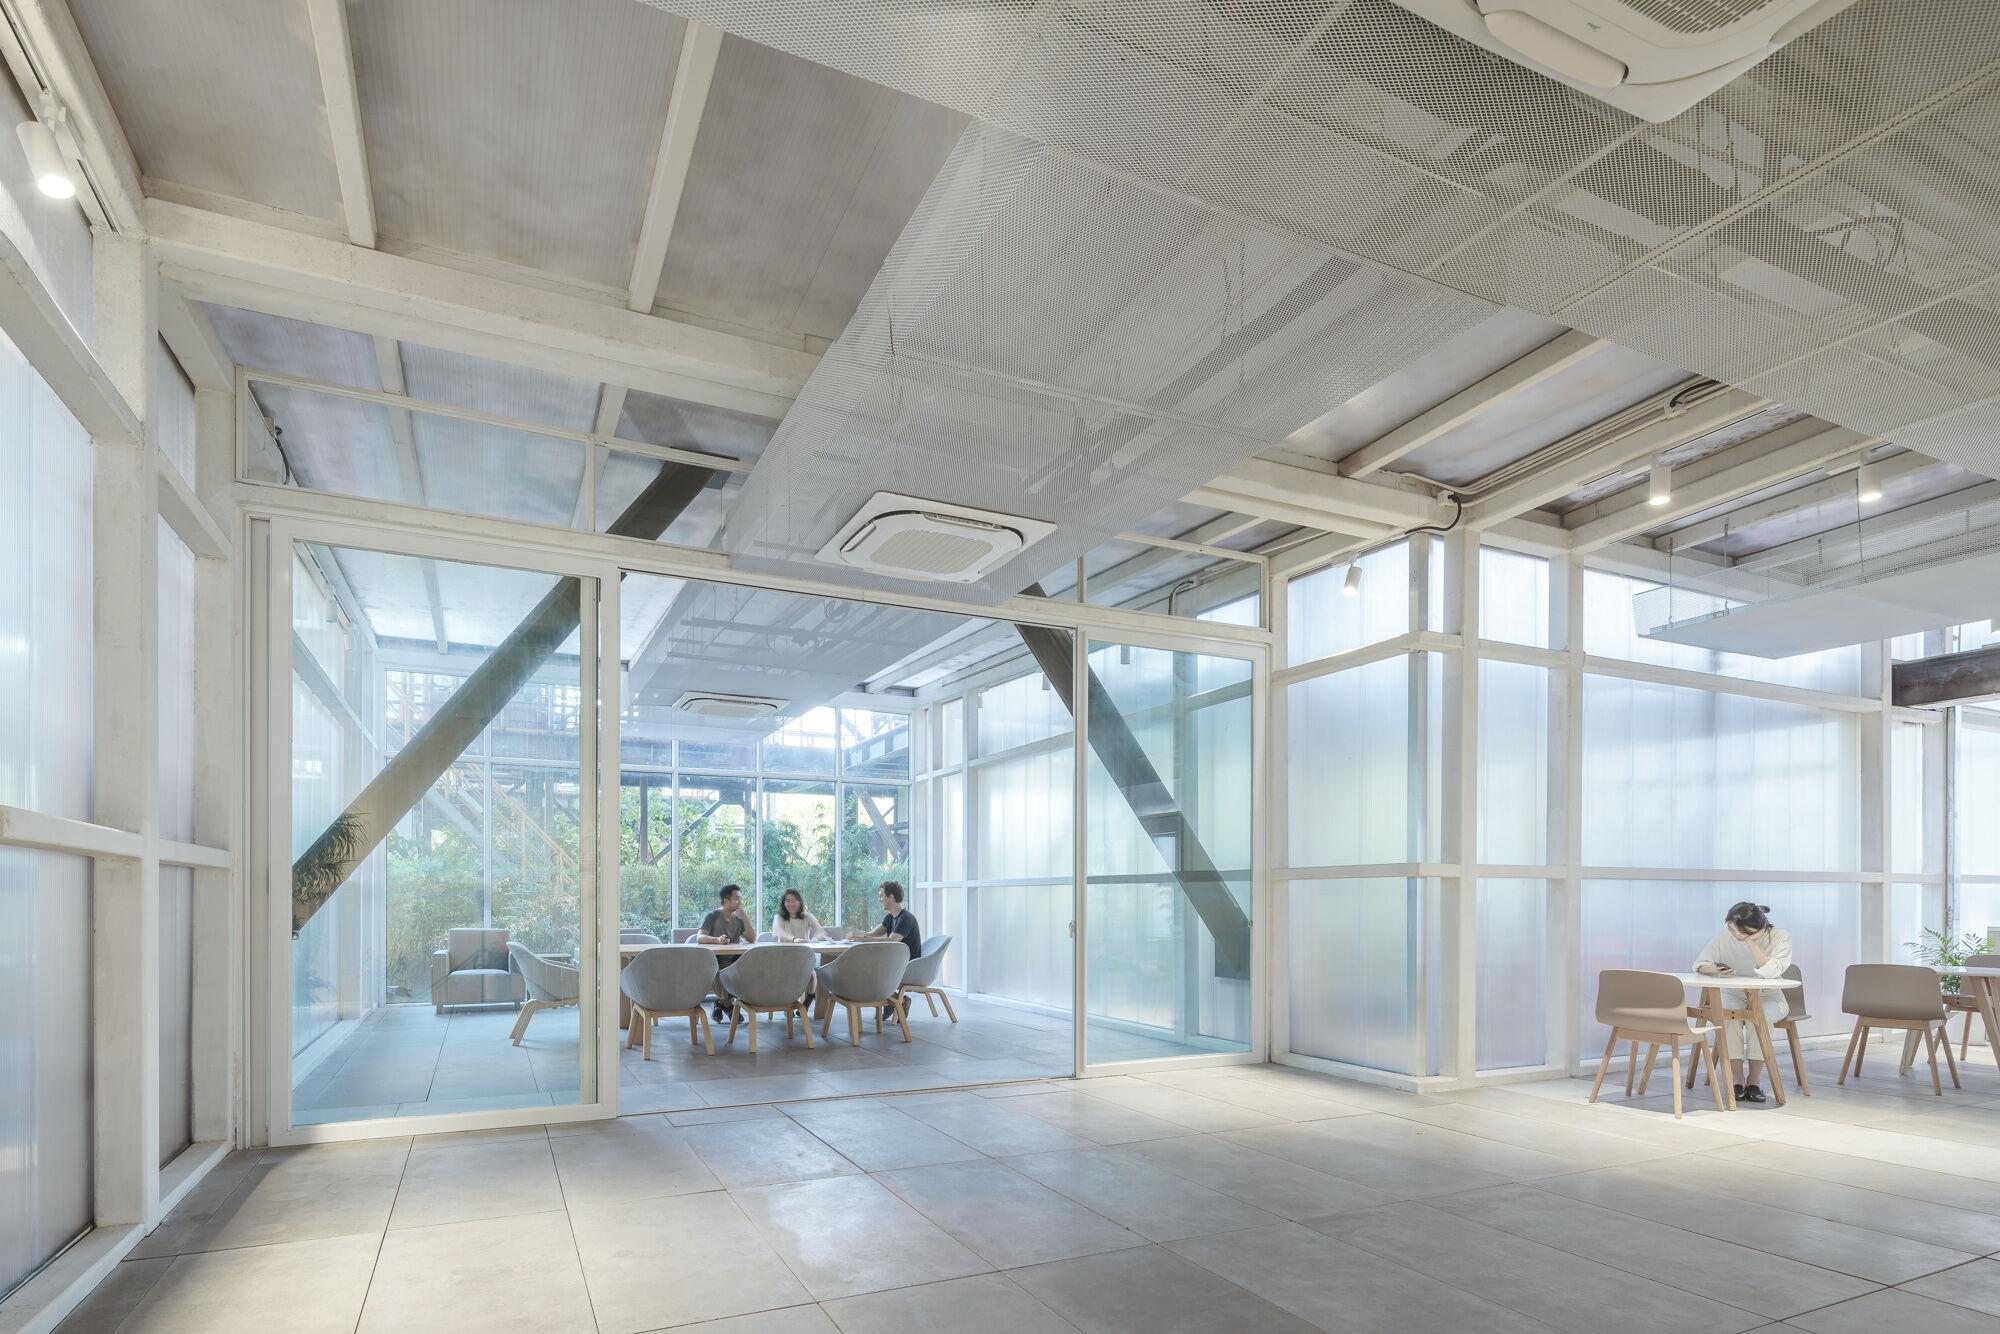 17_lounge and meeting room休息区及会议室.jpg